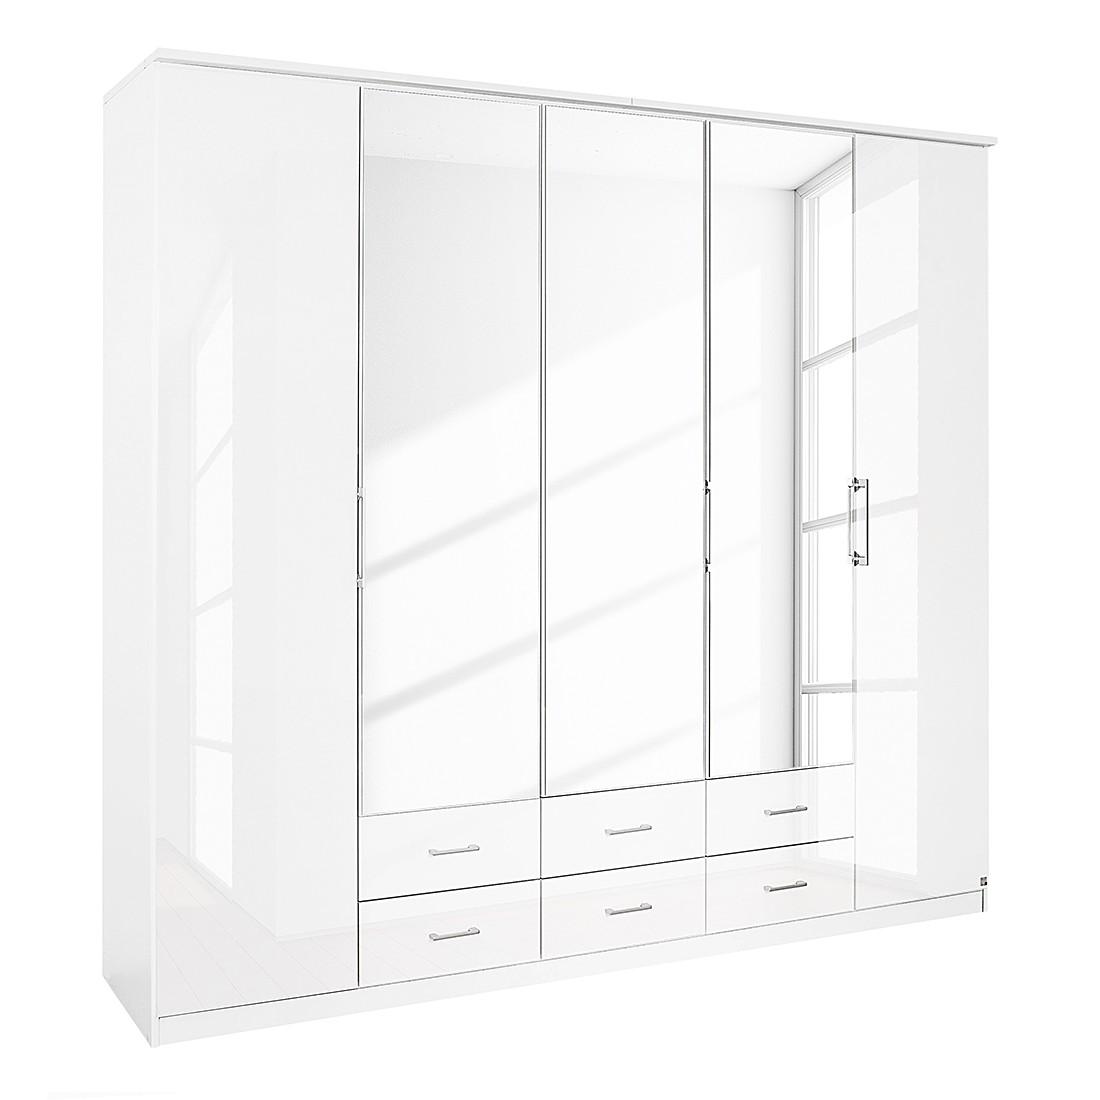 Armoire à portes pliantes Ellwangen - Blanc alpin / brillant 226 x 199 cm 5, Rauch Packs